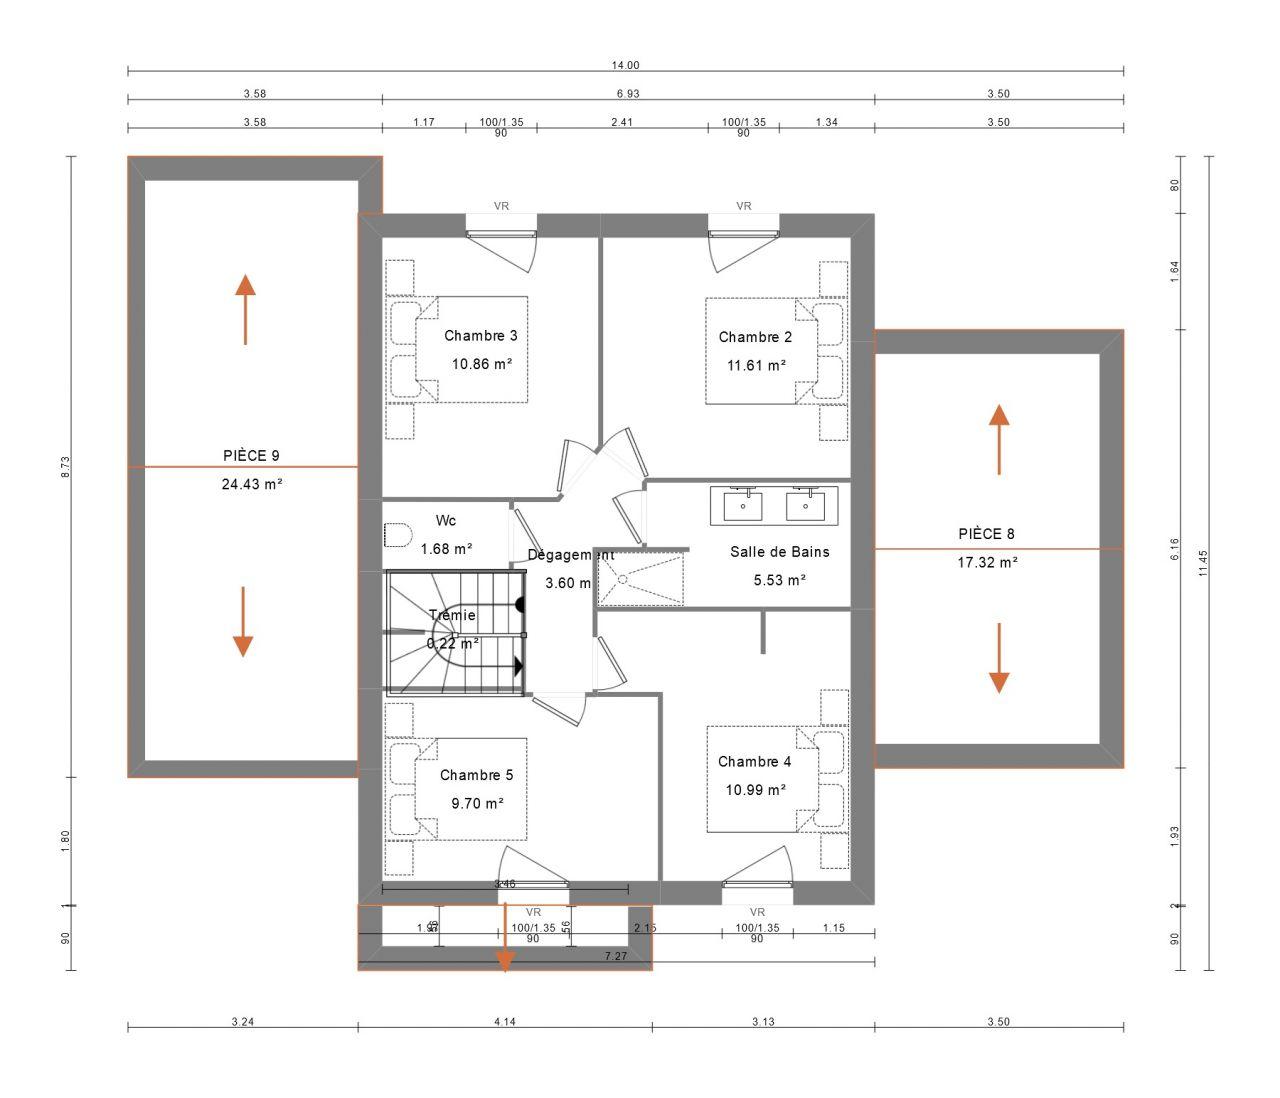 Plan étage avec côtes